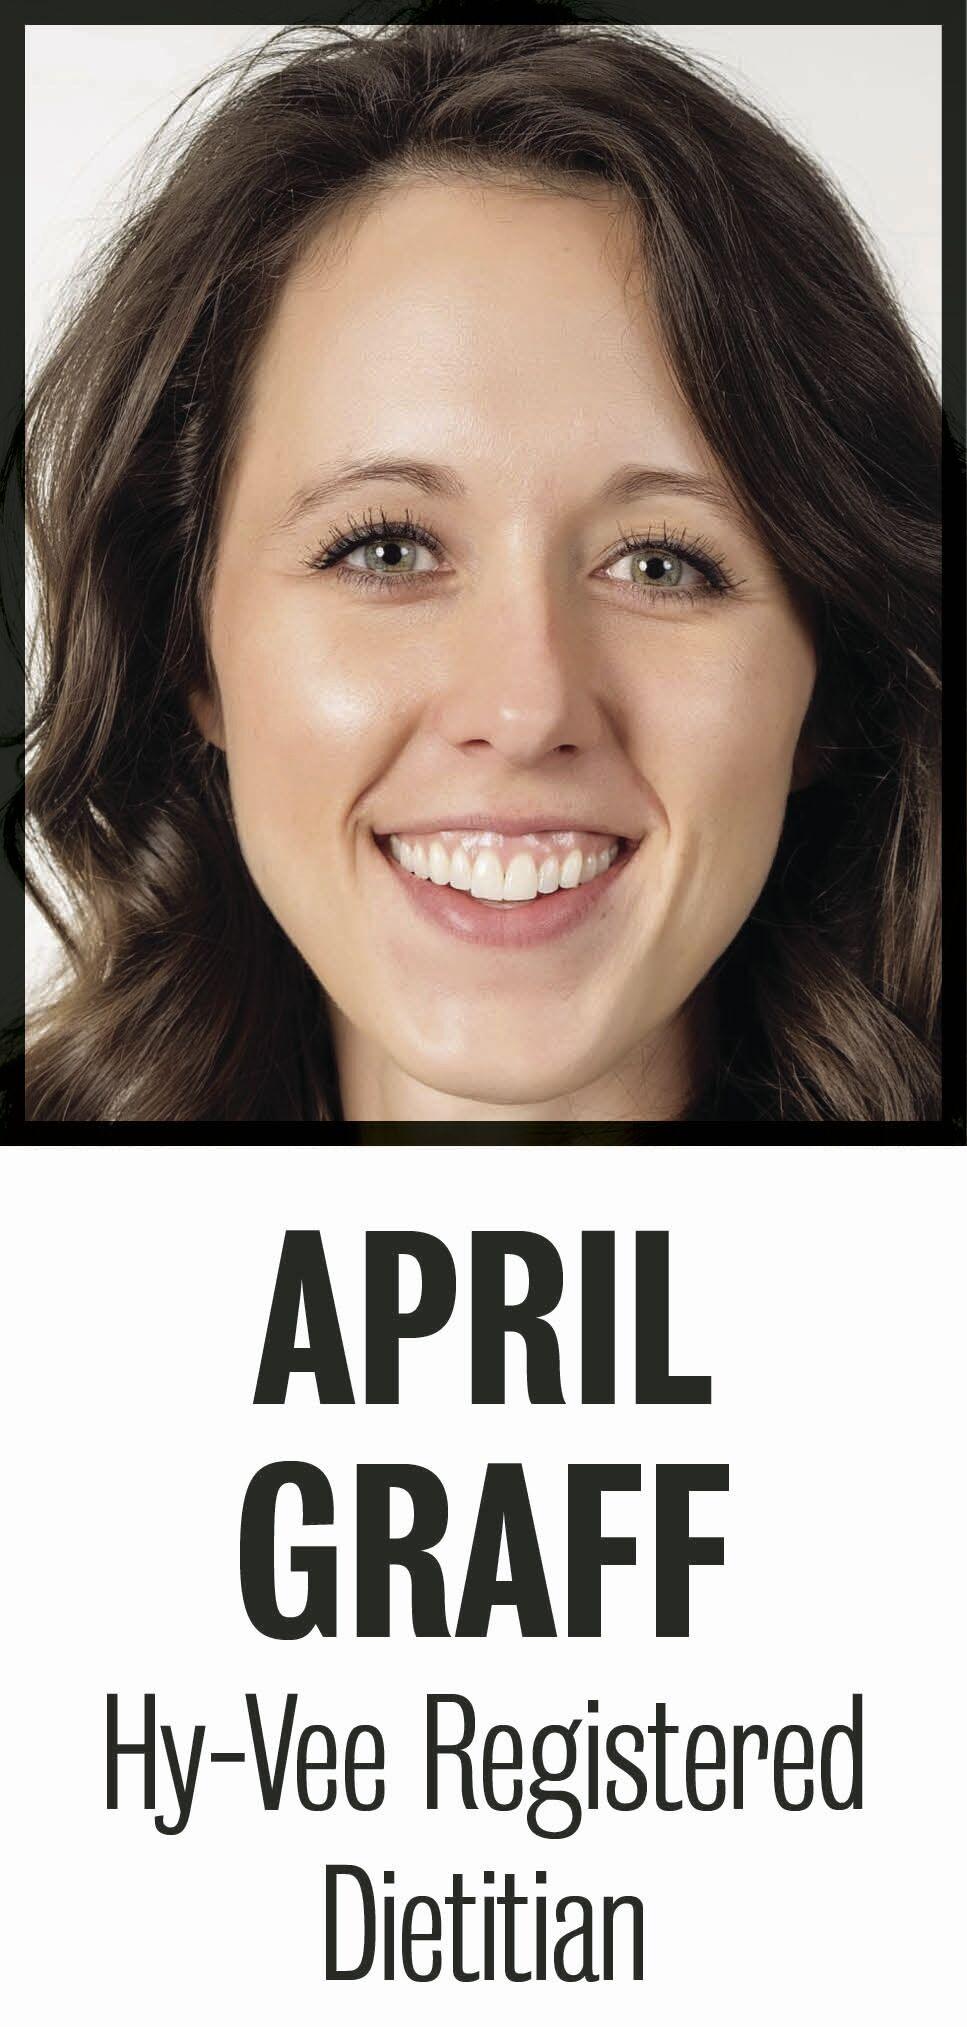 AprilGraffByline